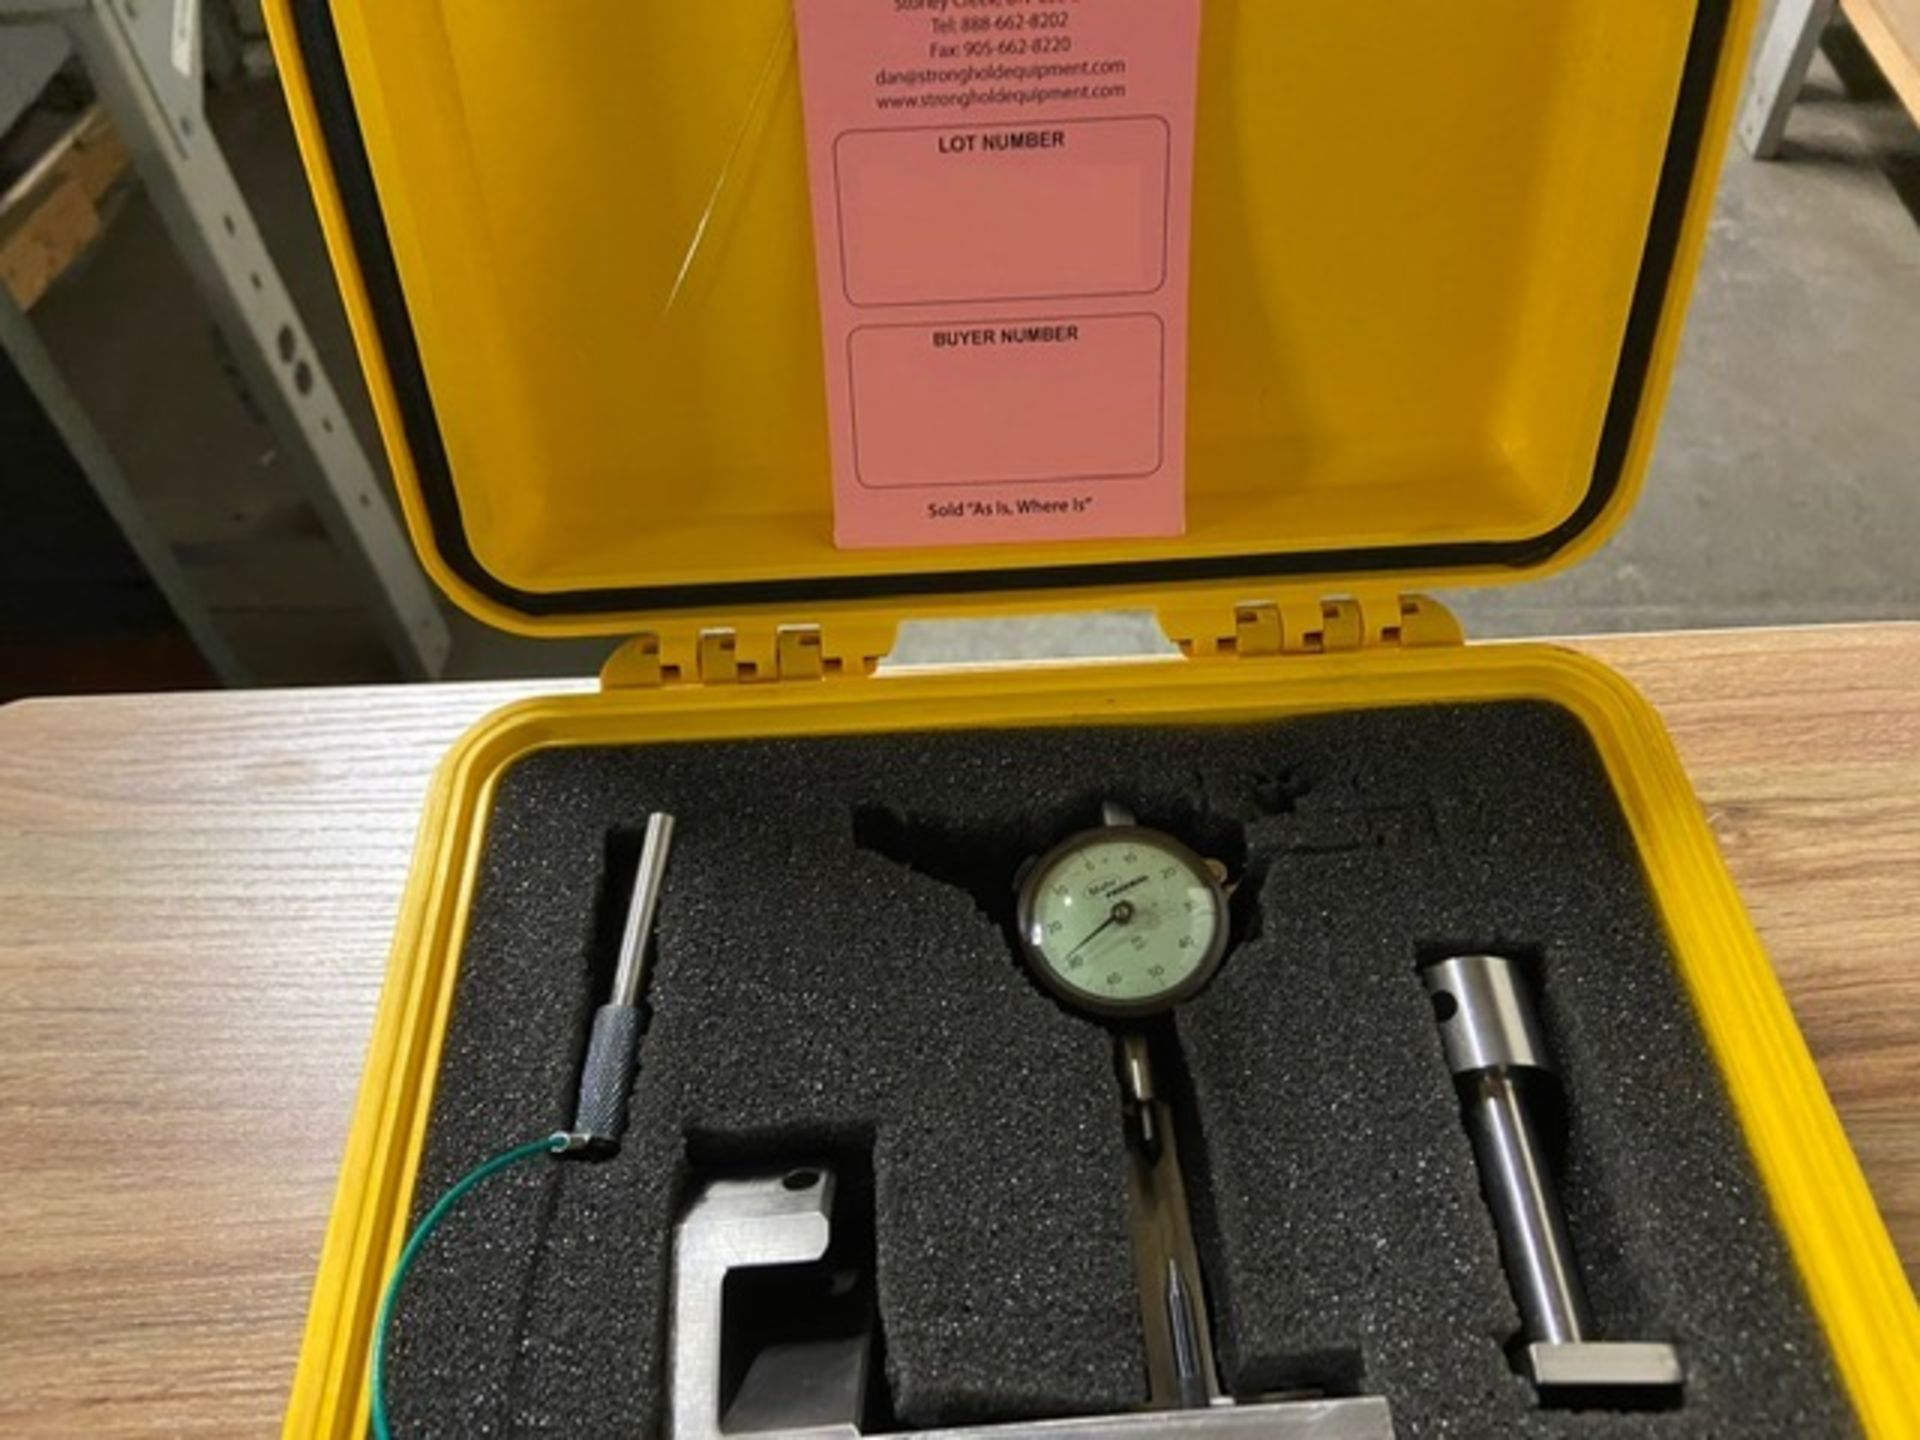 Mahr-Federal Inspection Kit